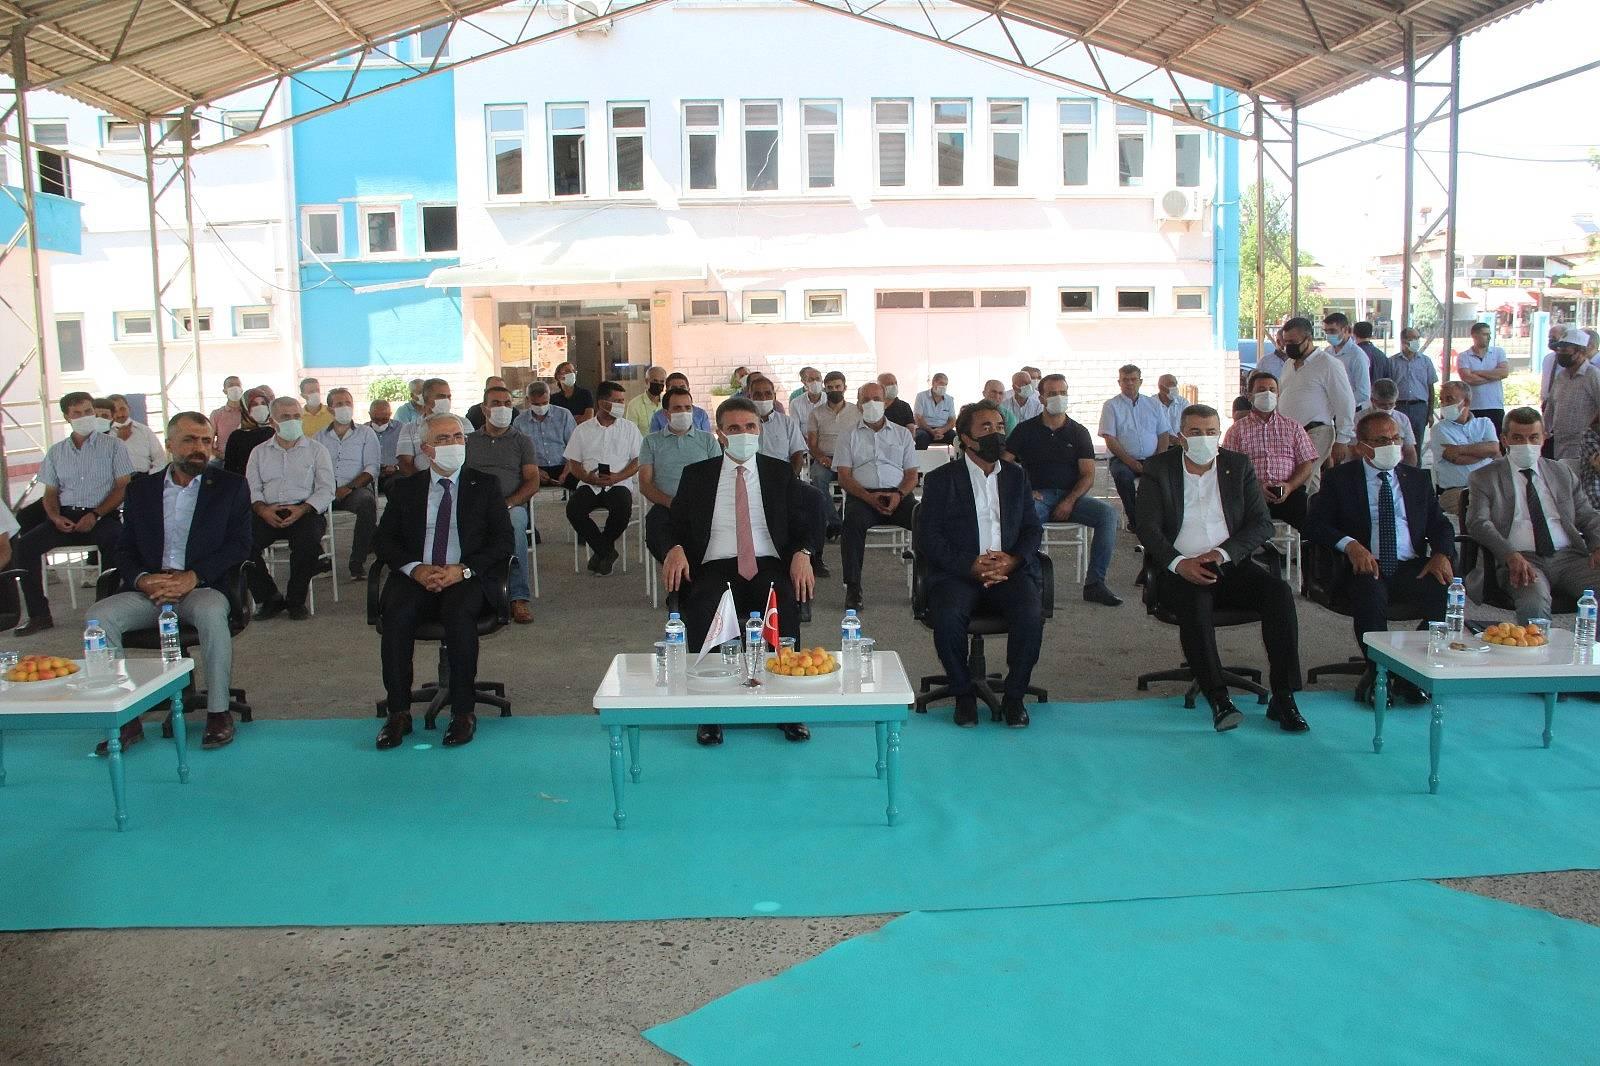 2021/07/malatya-valisi-barus-koyun-kirkti-20210729AW38-3.jpg